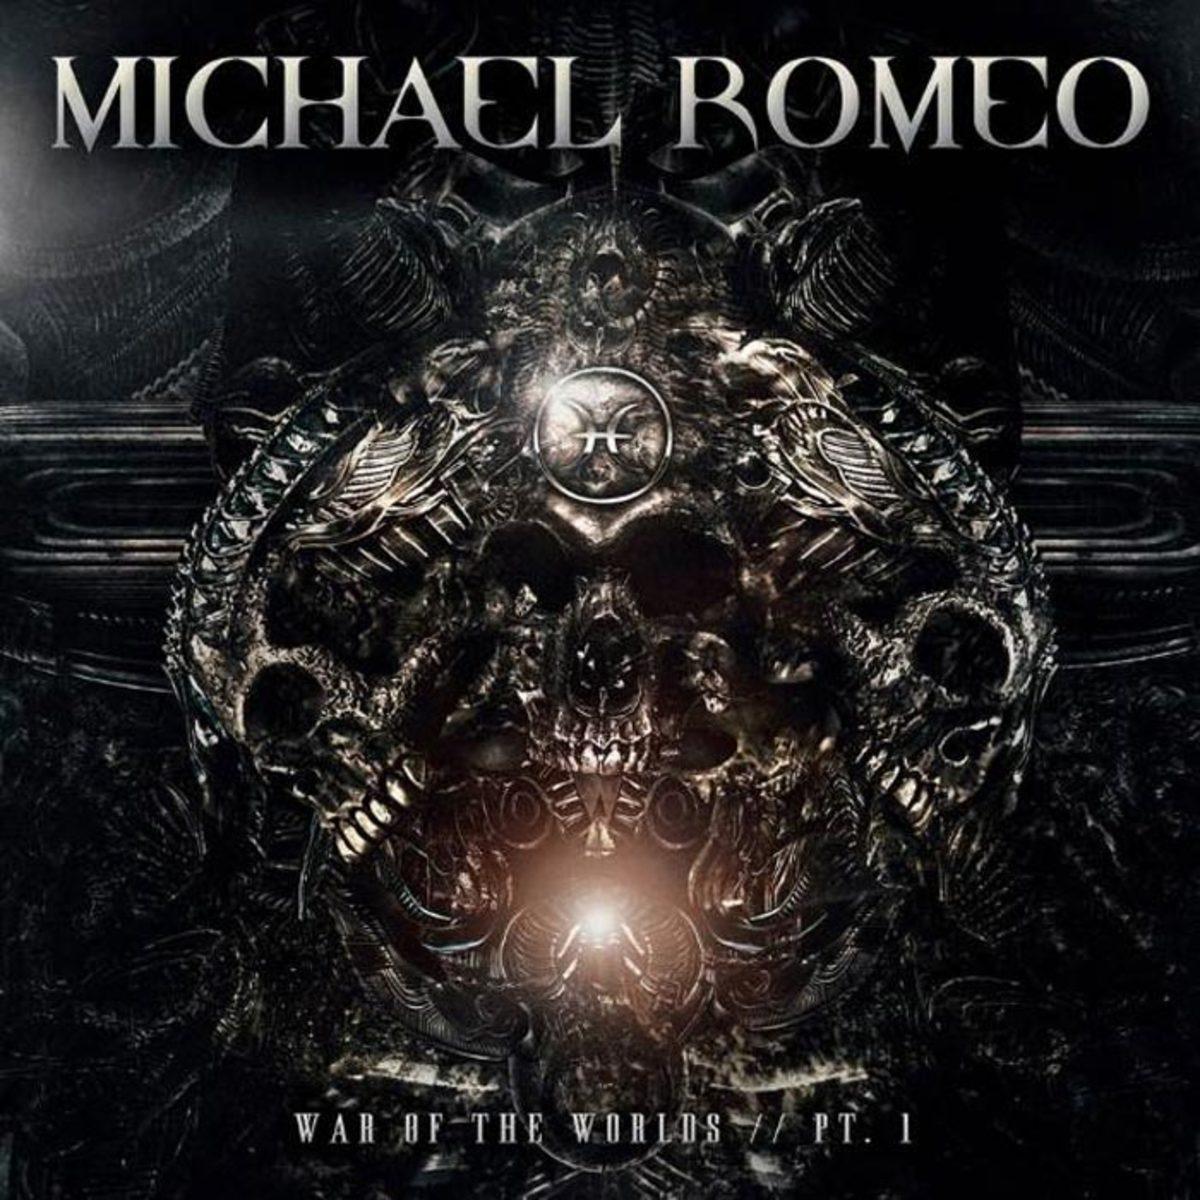 Michael Romeo: War of the Worlds, Pt. 1